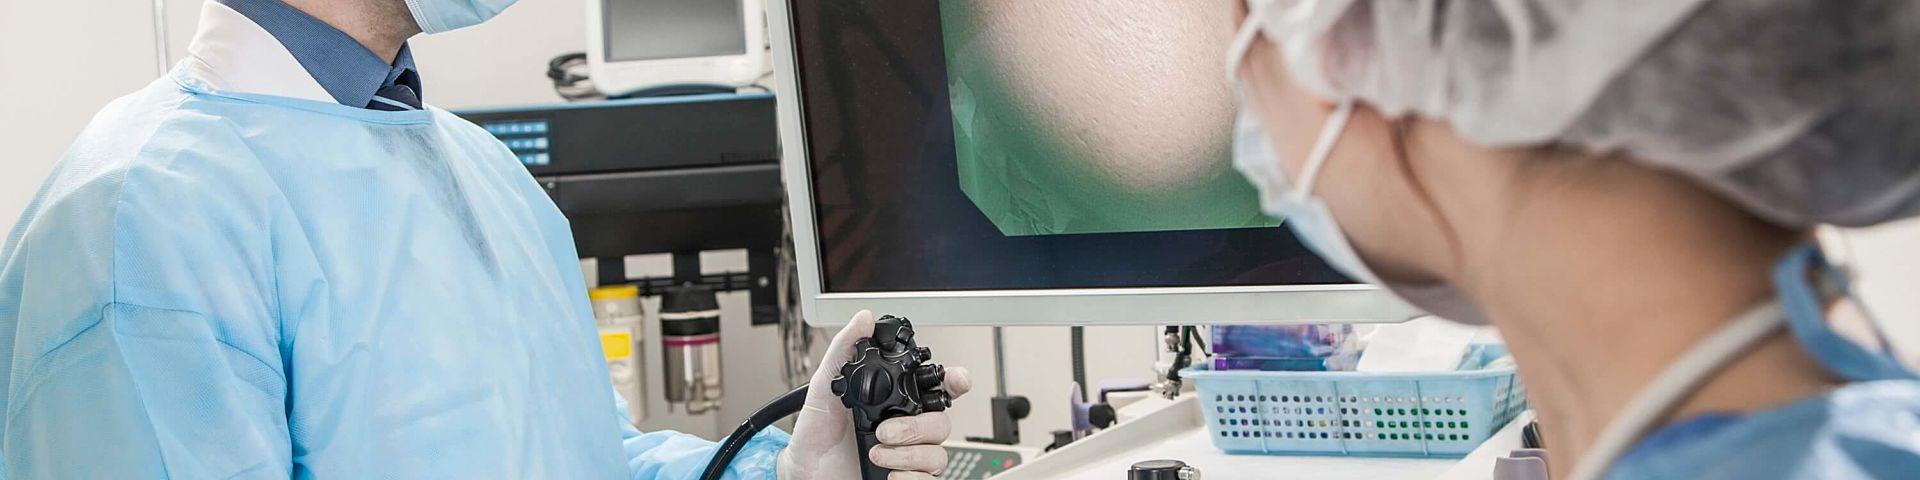 Small Bowel Endoscopy